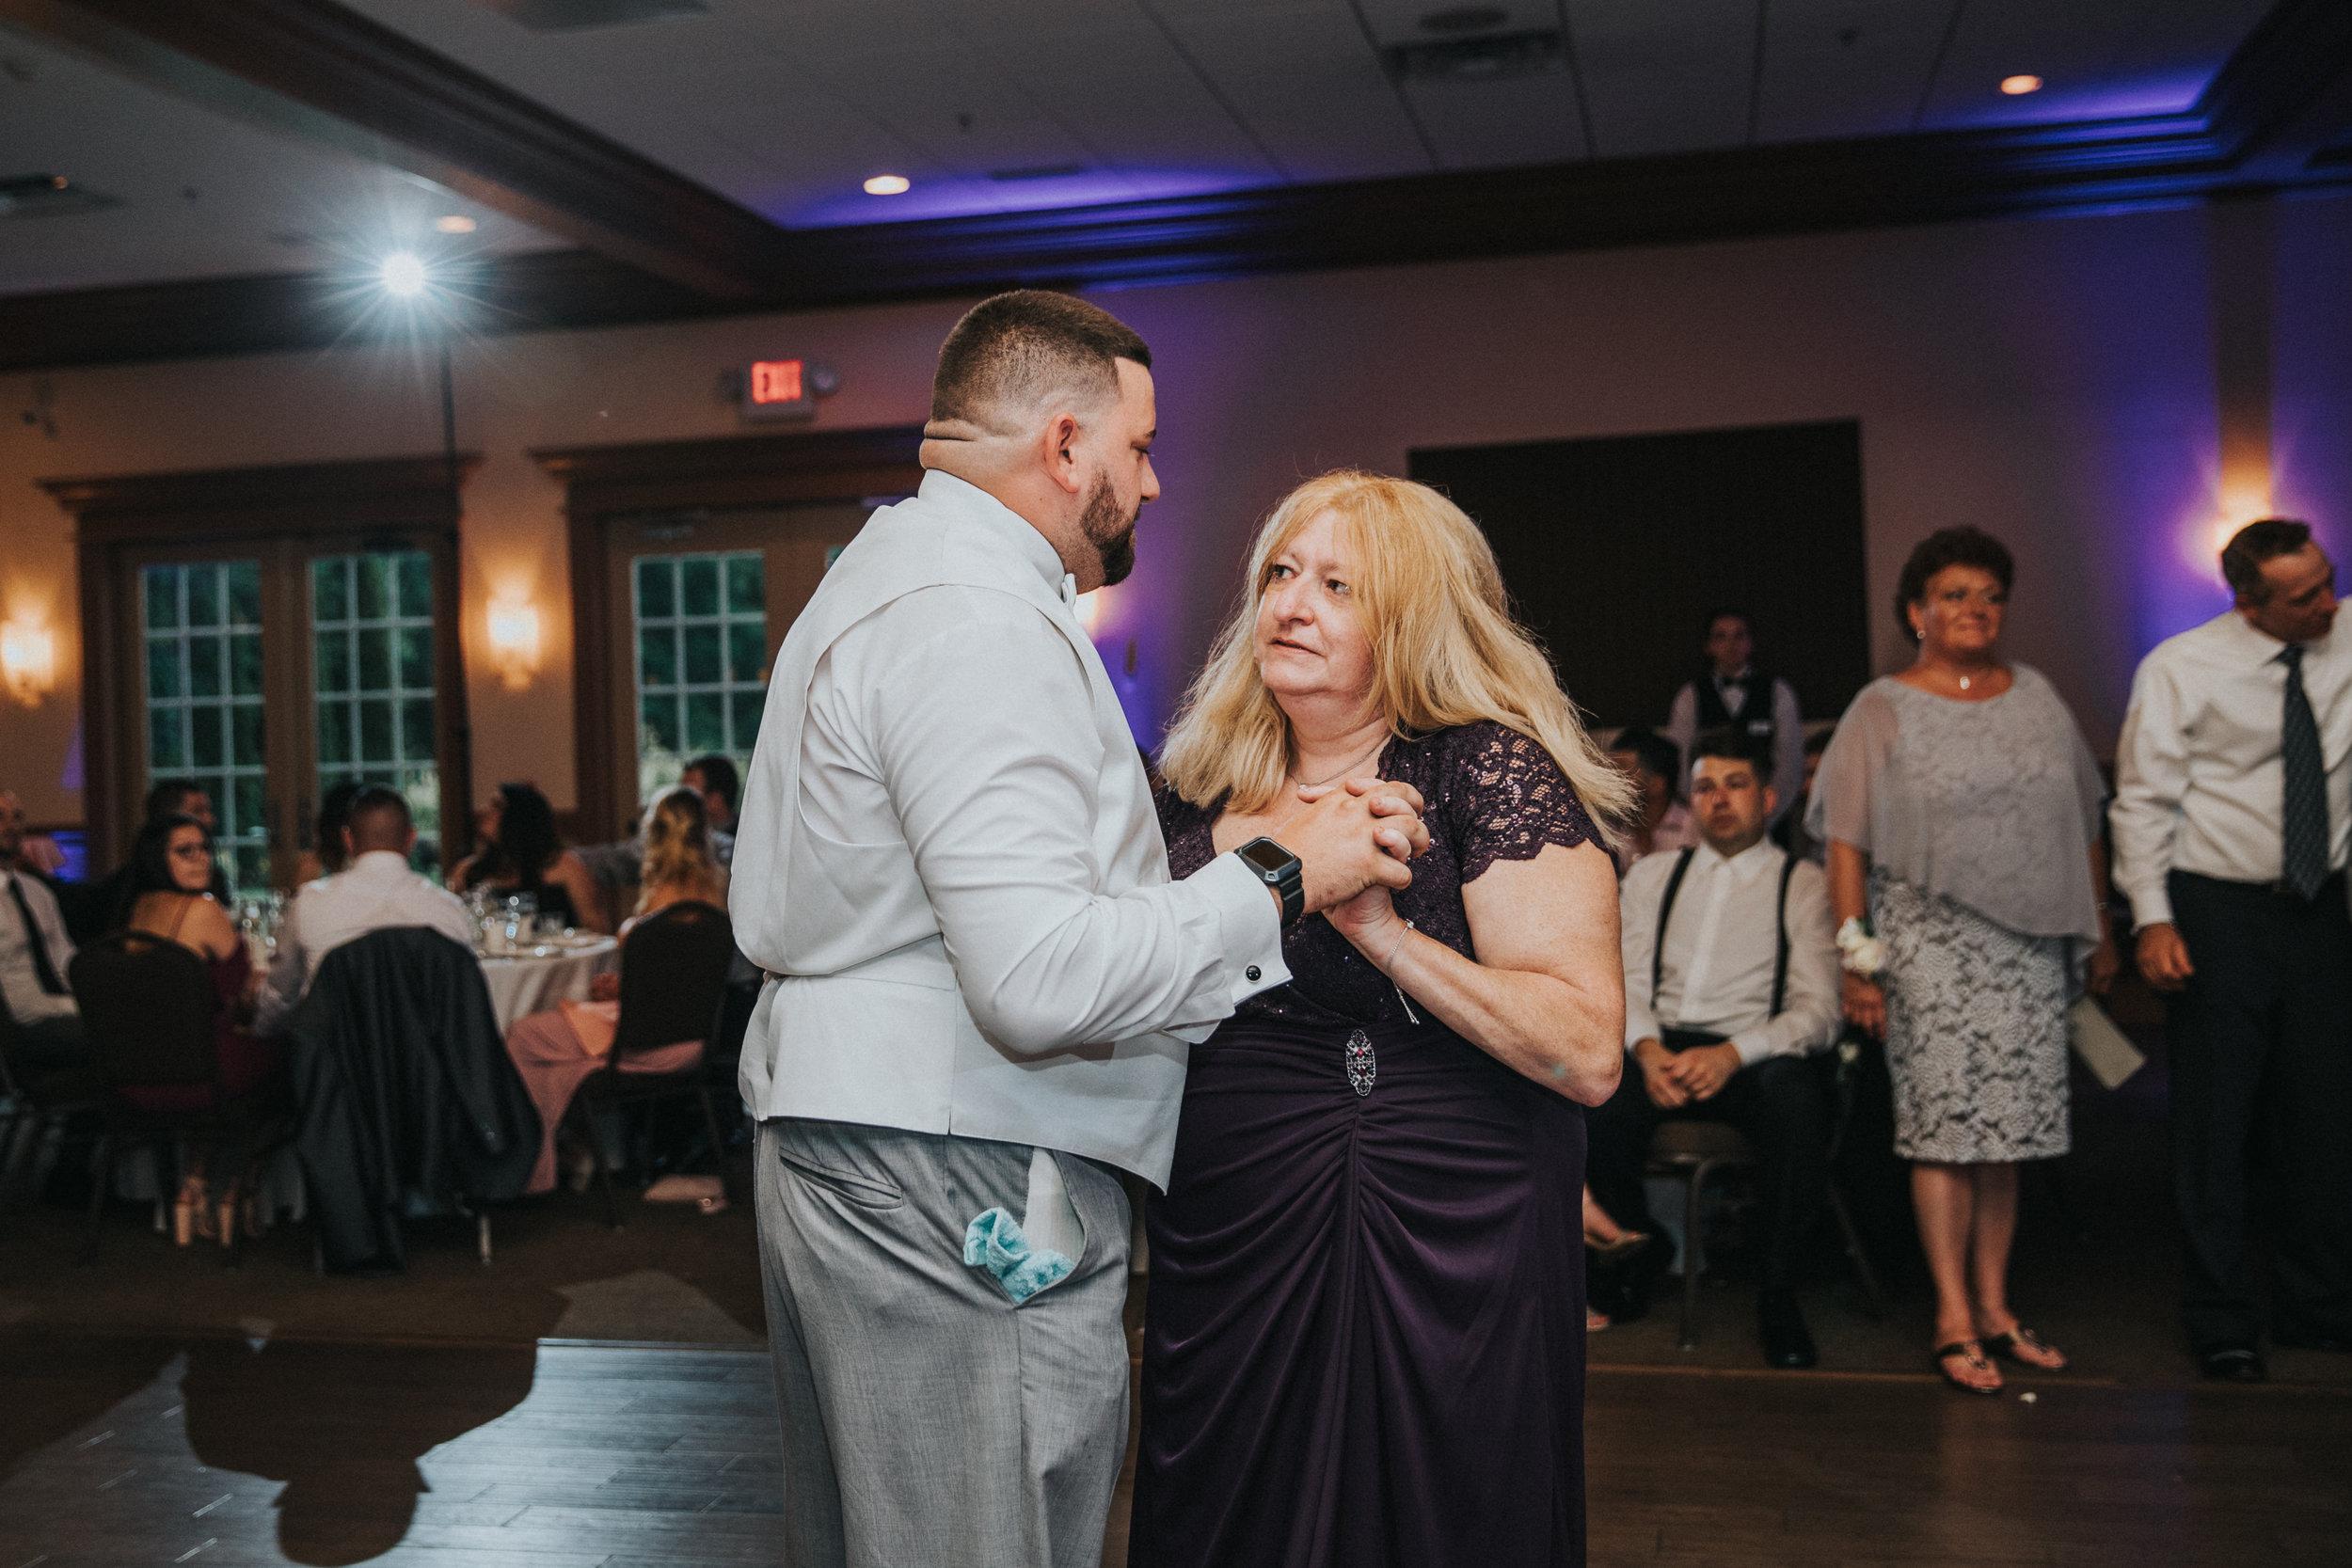 New-Jersey-Wedding-Photographer-JennaLynnPhotography-ValenzanoWinery-Reception-51.jpg